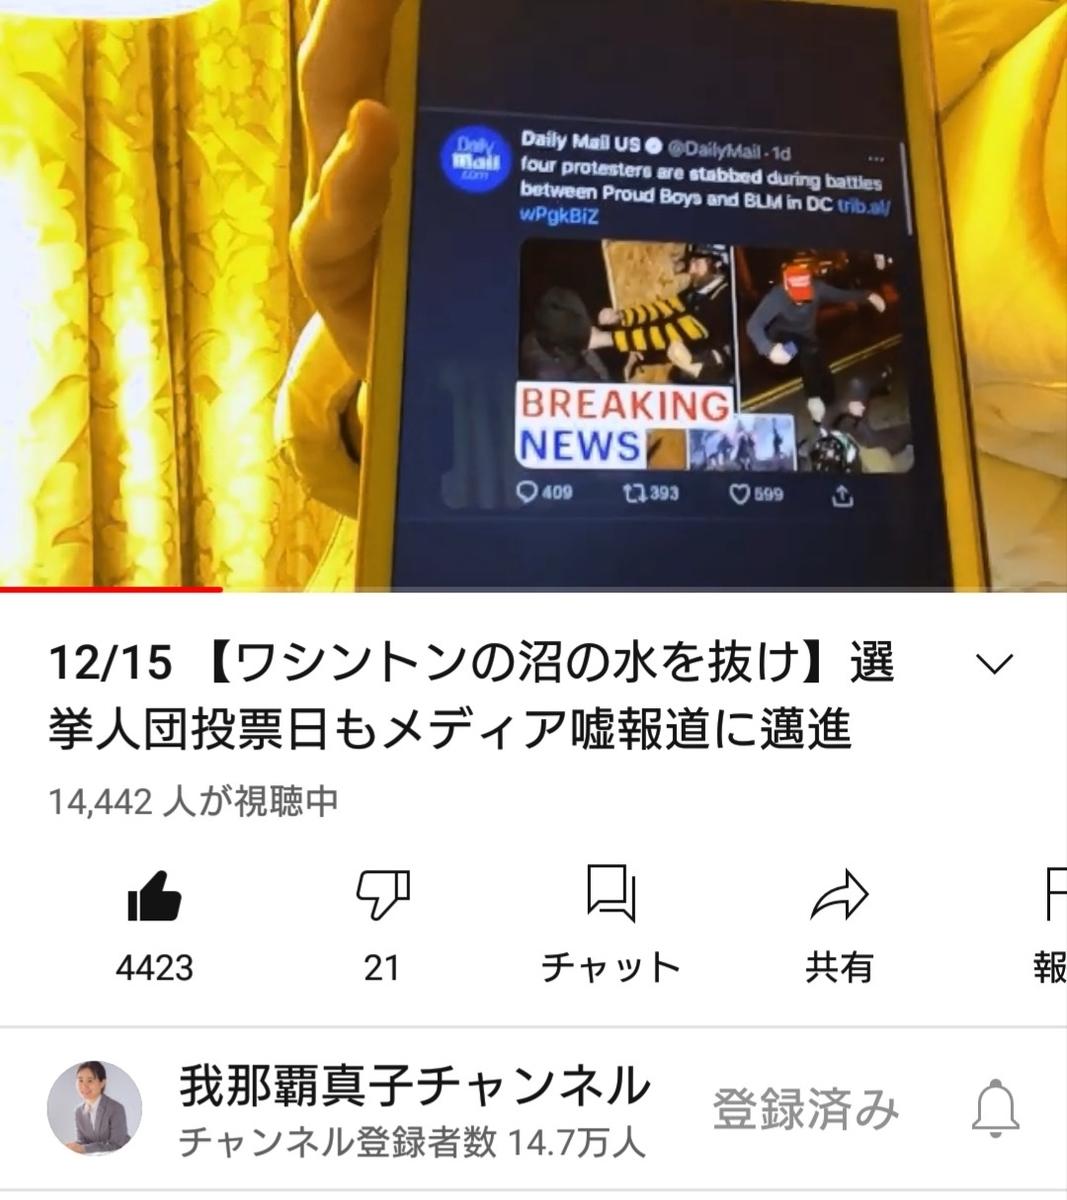 f:id:wasurenagusa7531kuma:20201216080244j:plain